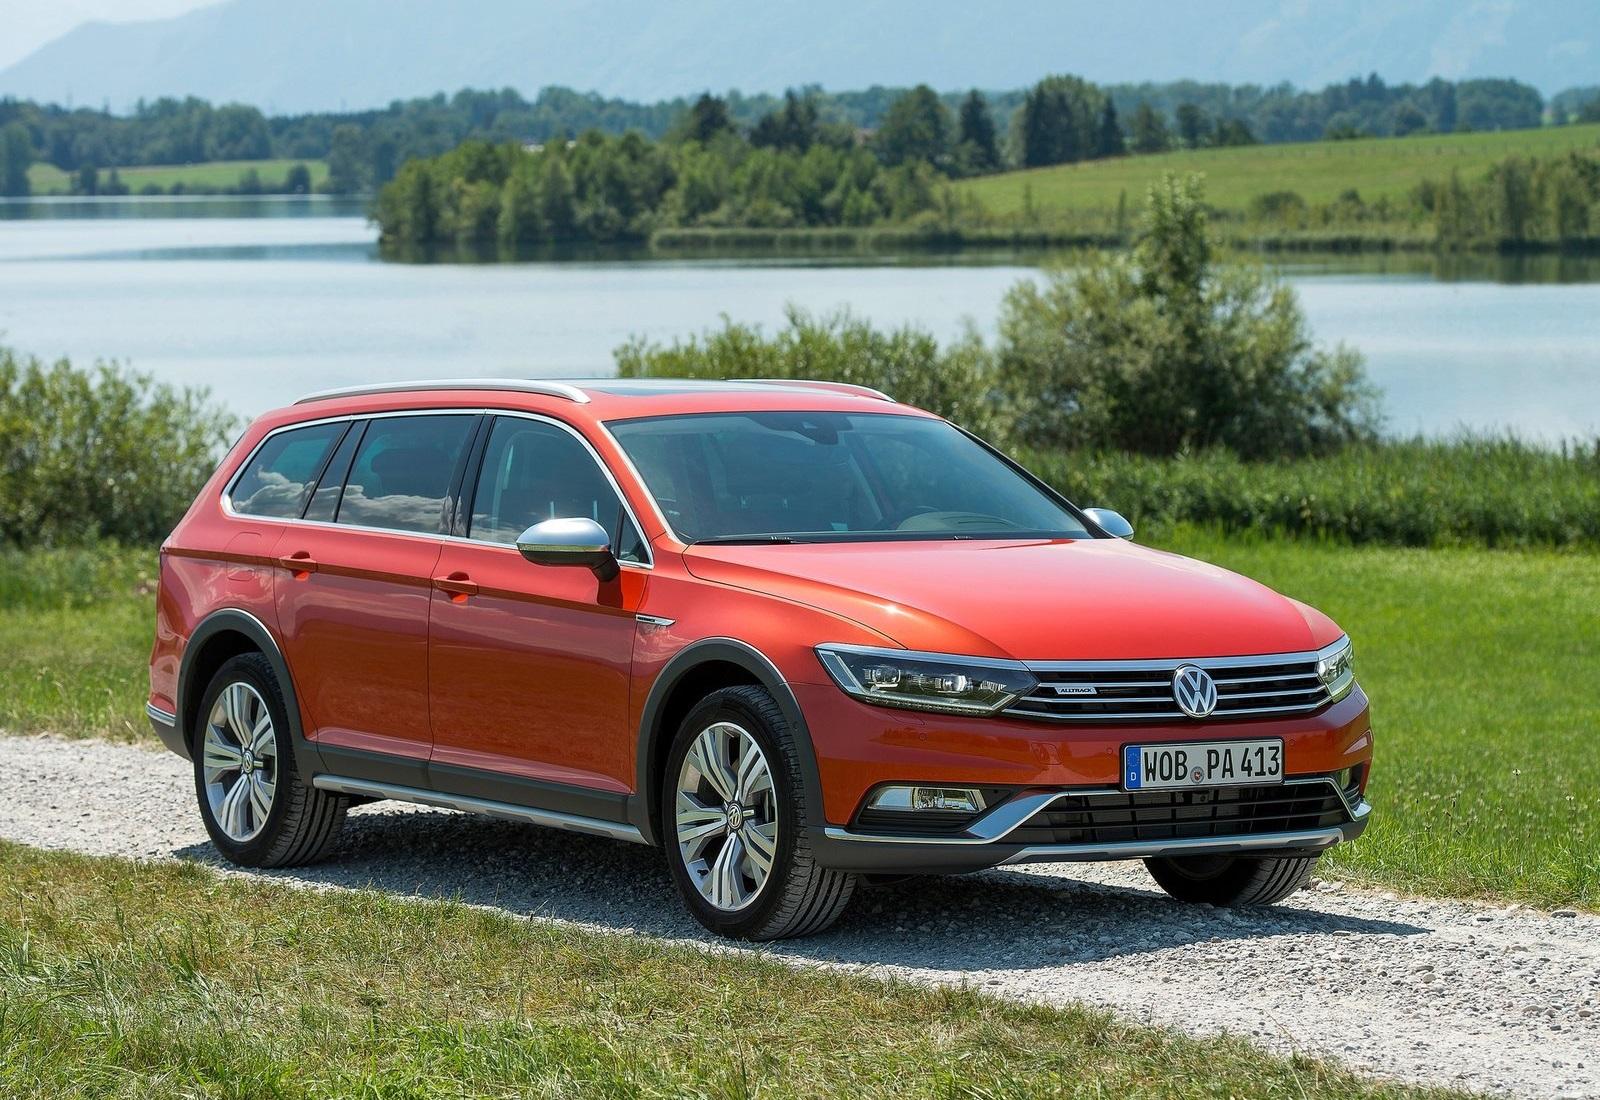 2016 Volkswagen Passat Alltrack SUV